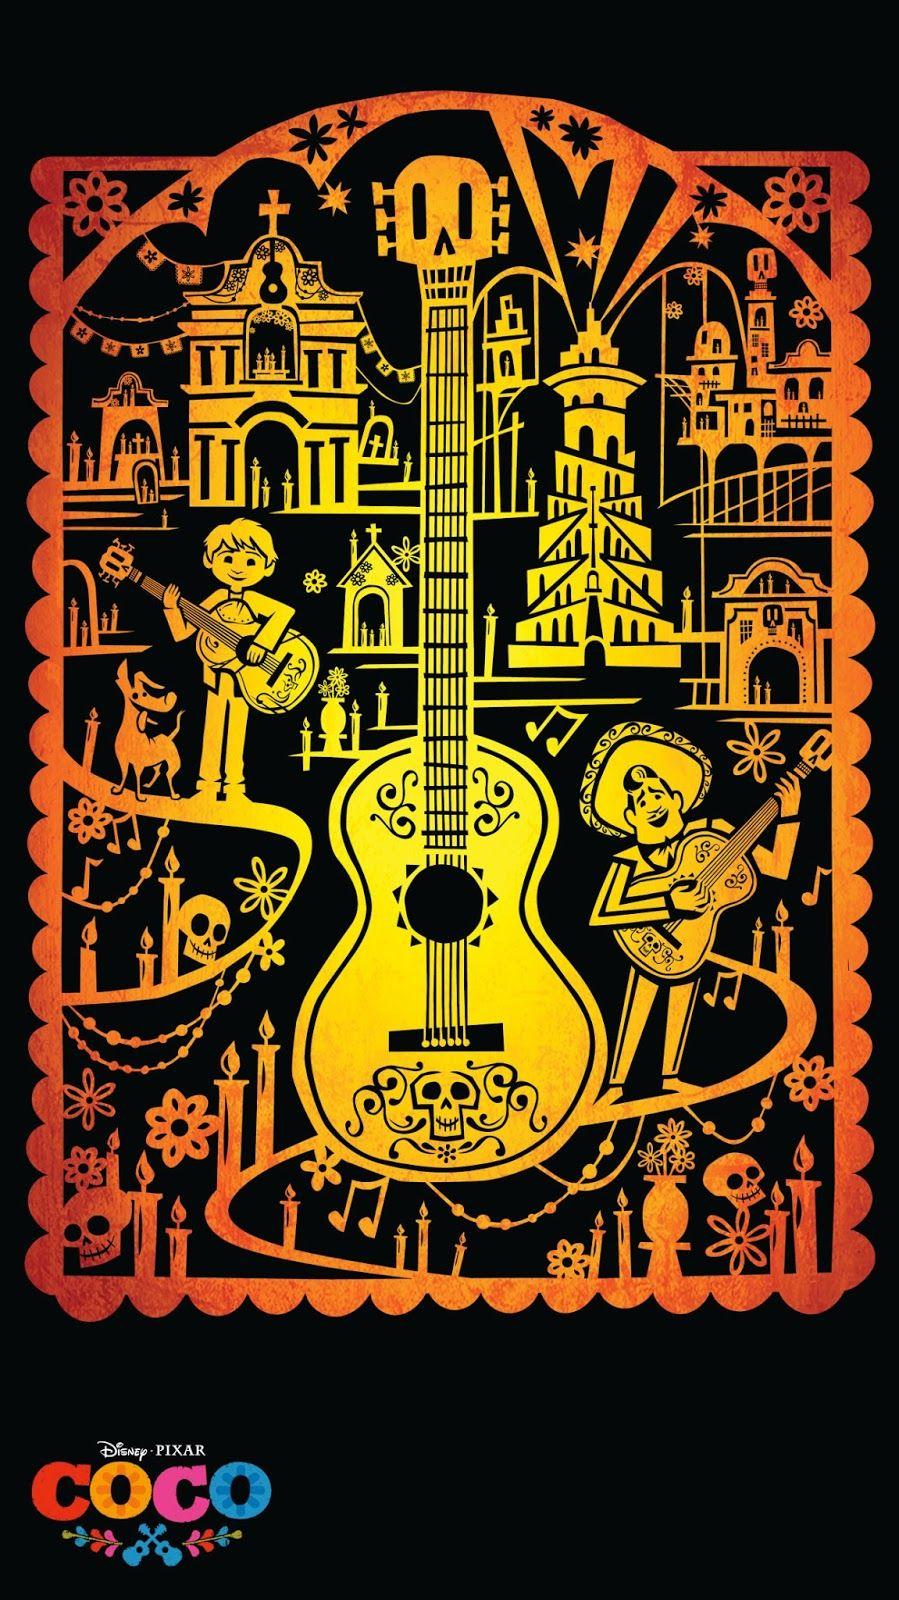 Pelicula De Pixar Coco Poster Empresas Pinterest Dreamworks  # Muebles Tio Ernesto